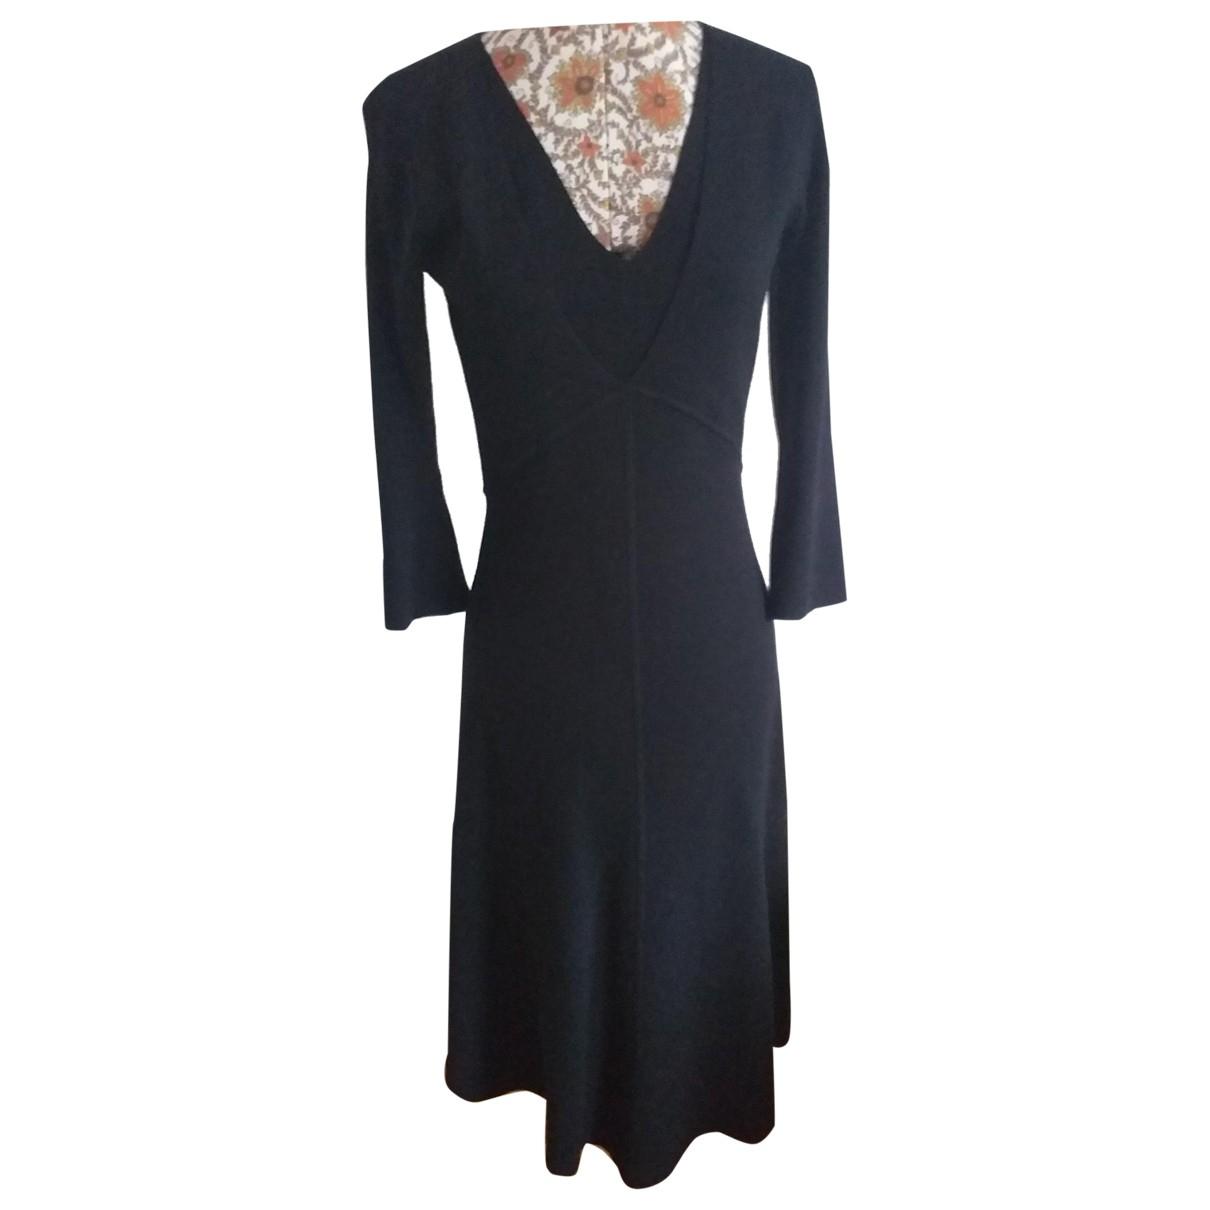 Jigsaw \N Black dress for Women XS International